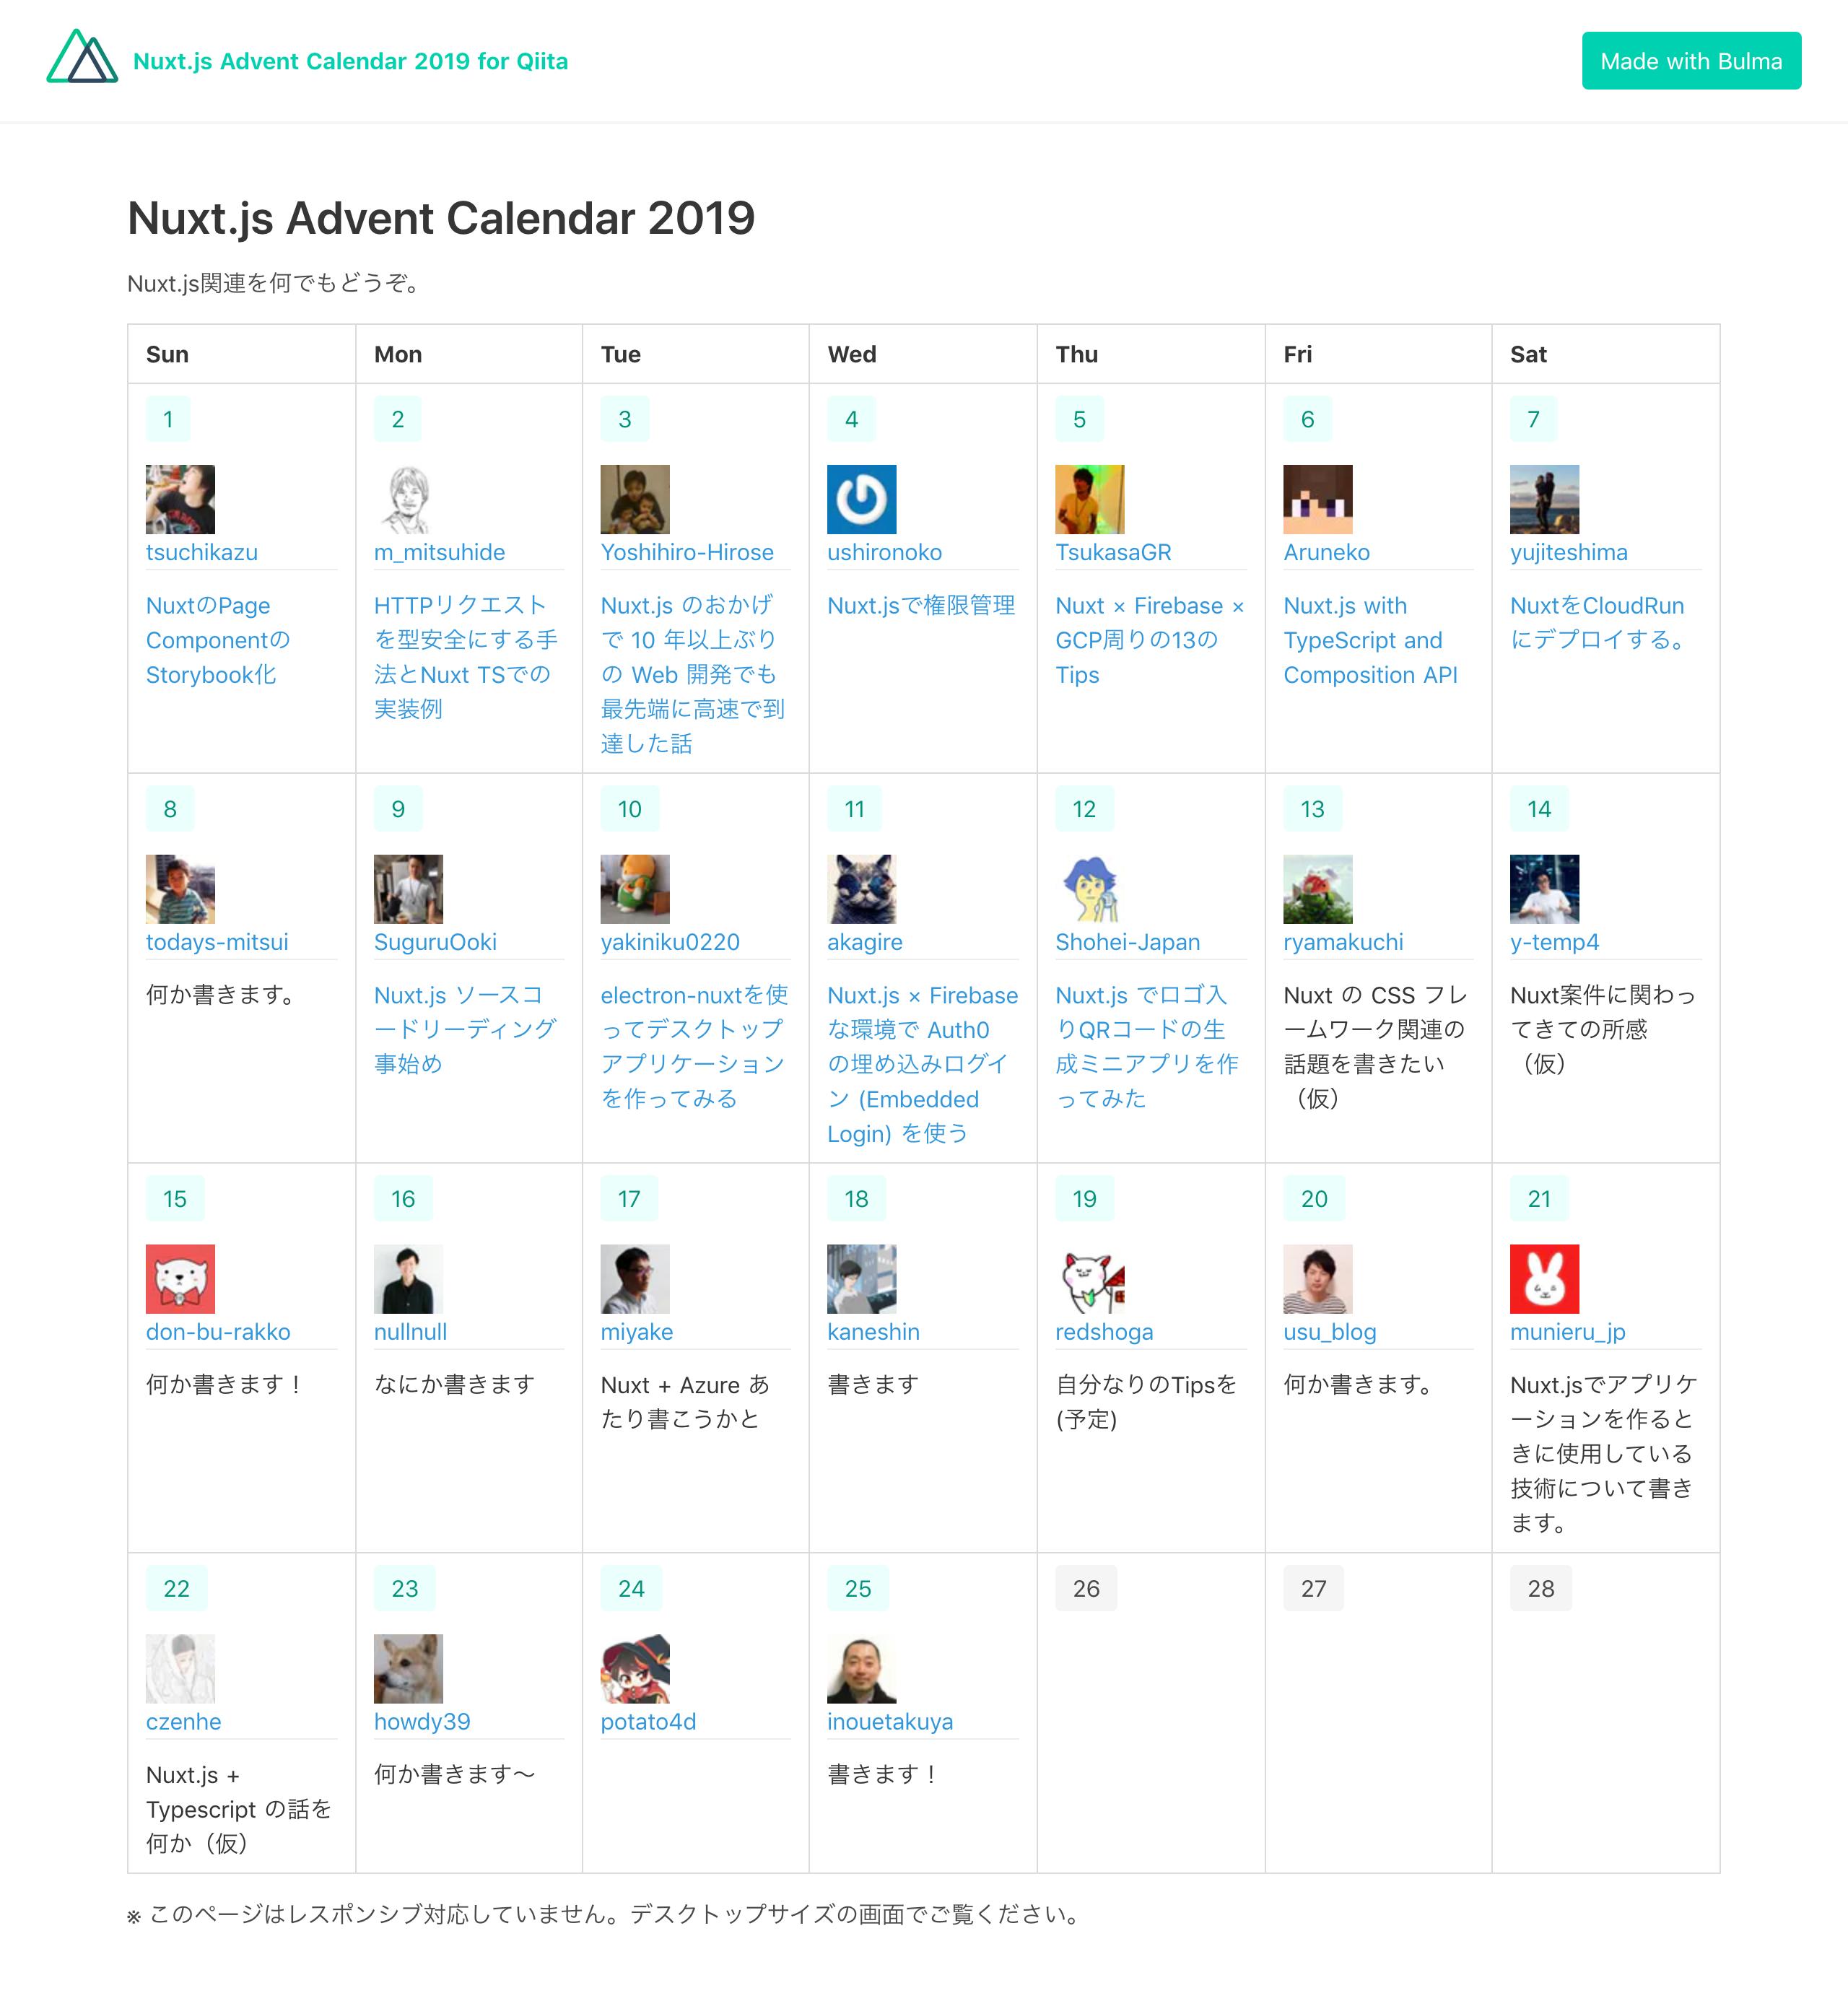 advent-calendar-2019-bulma.netlify.com.png